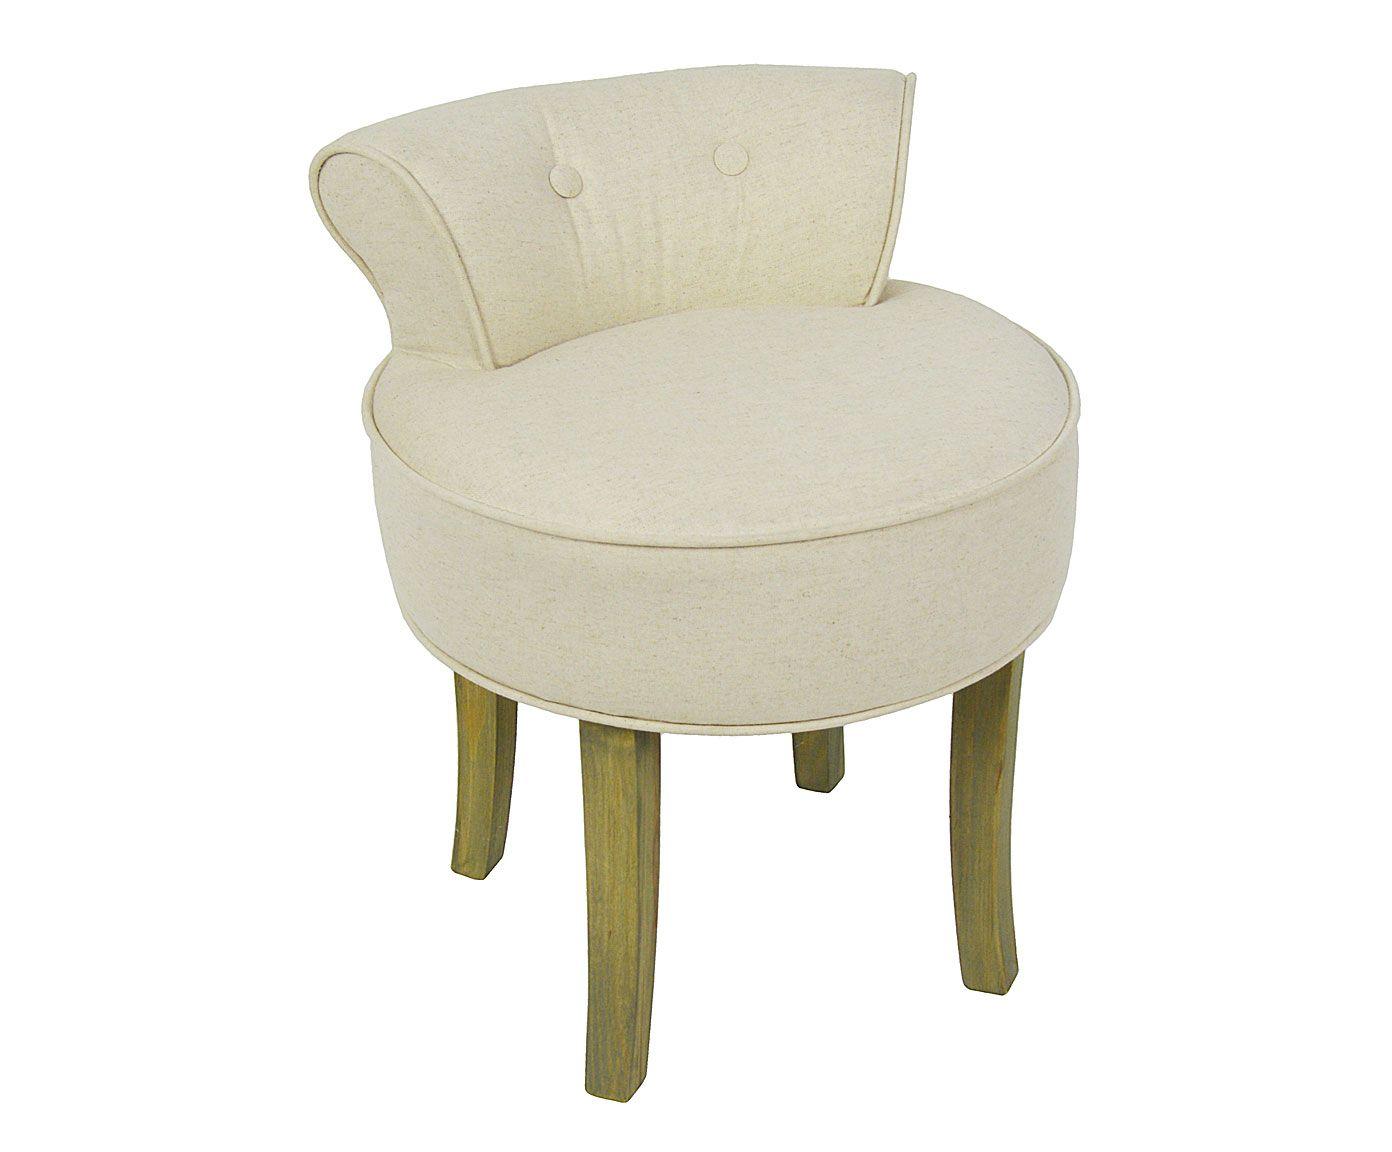 Baby chair in legno senza schienale VERONICA - 57x47 cm ...